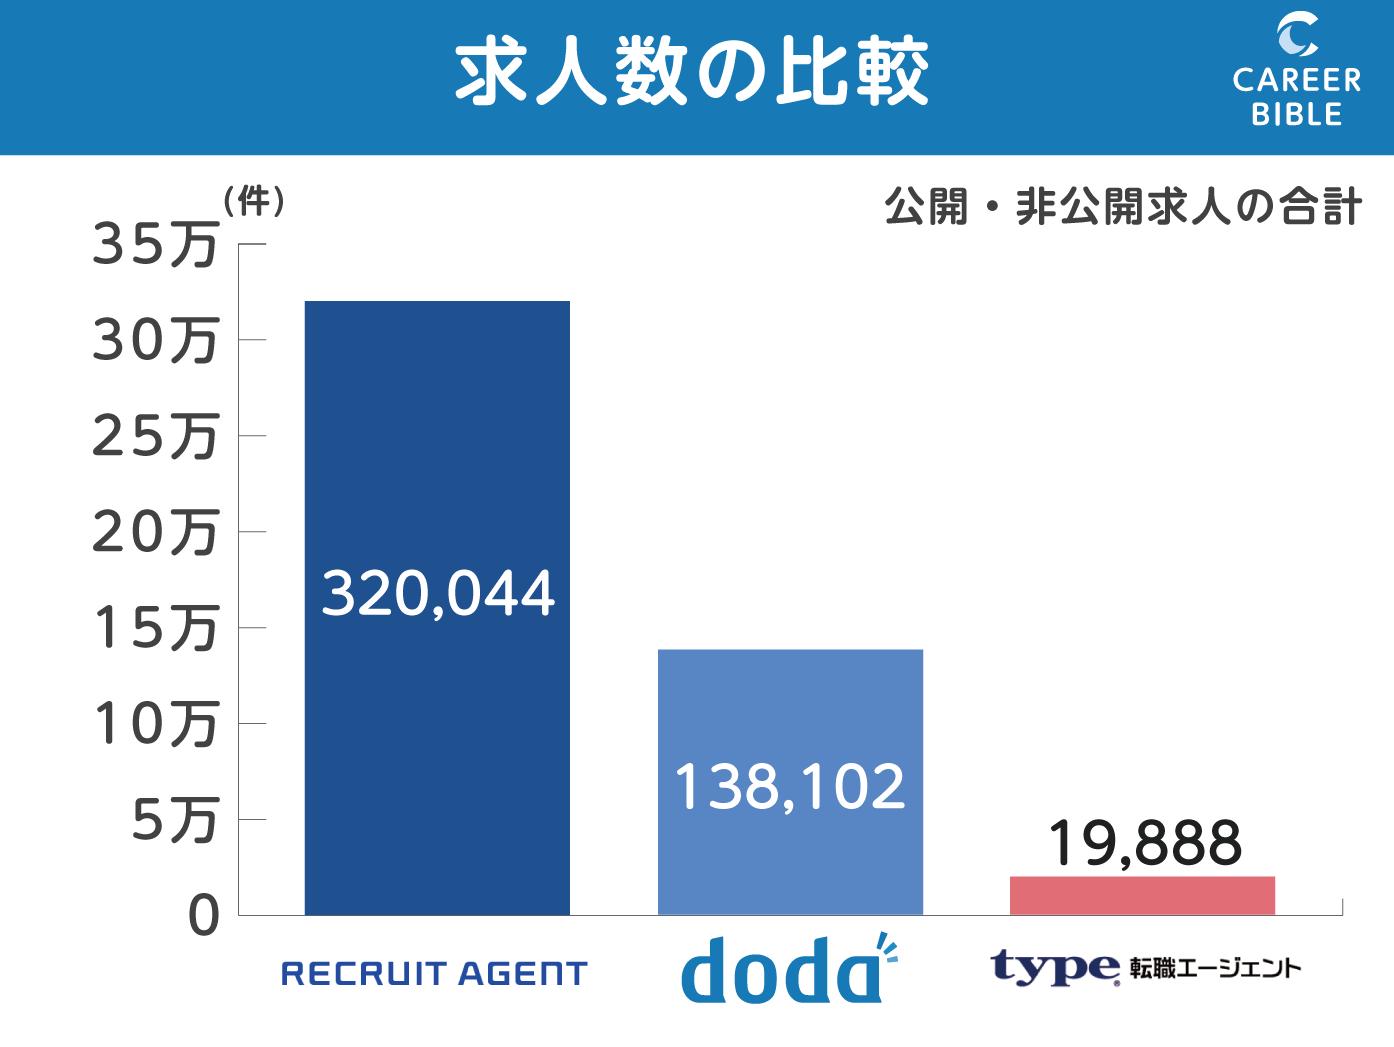 type転職エージェント_求人数の比較